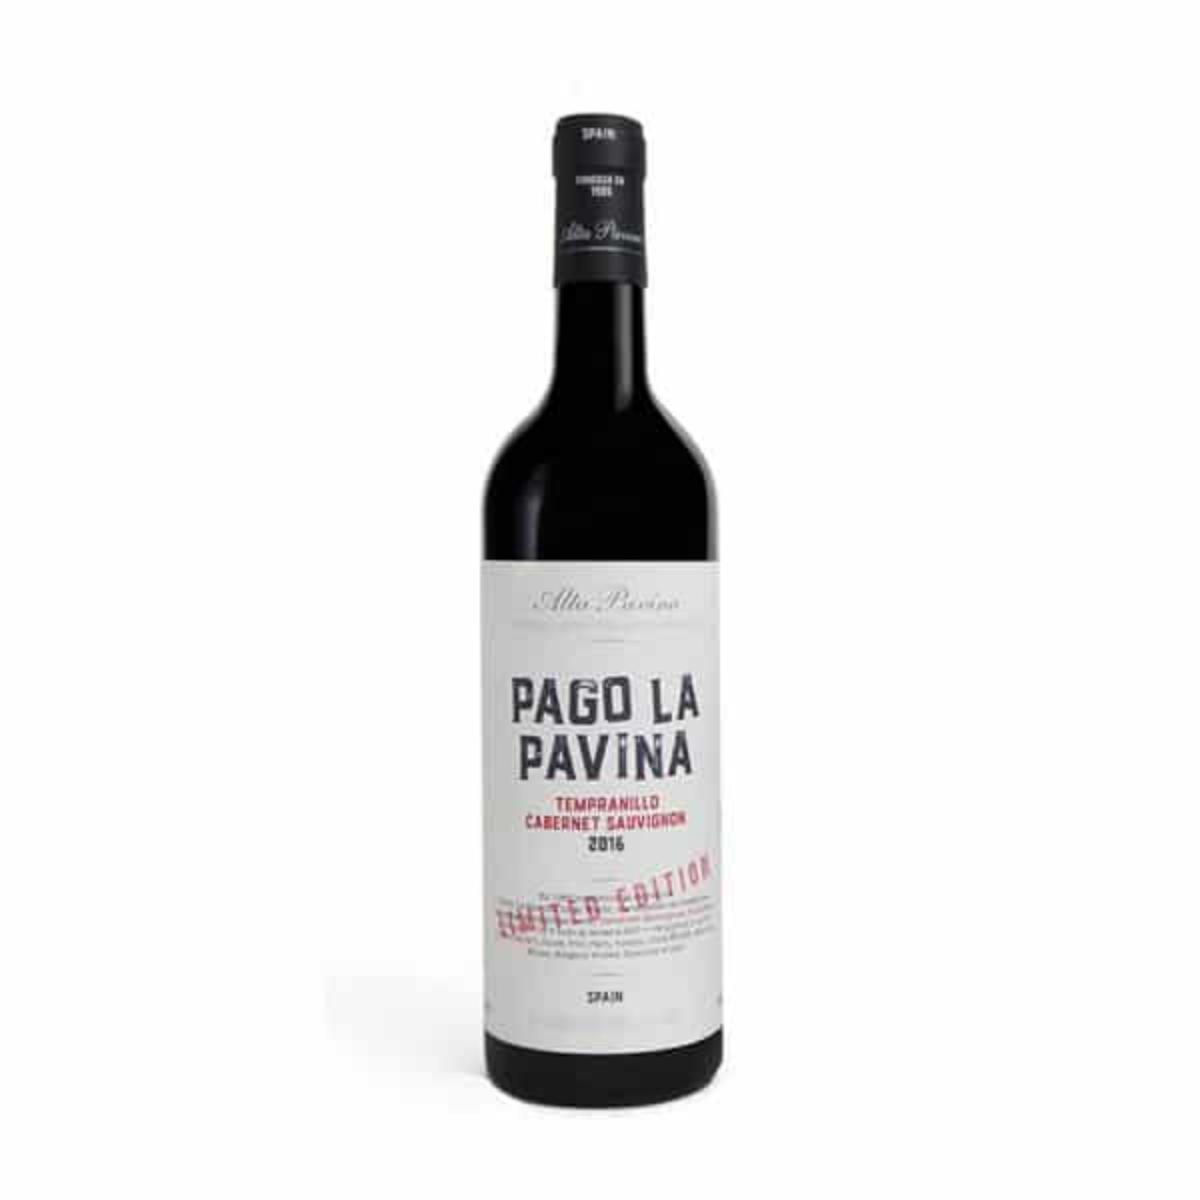 Pago La Pavina